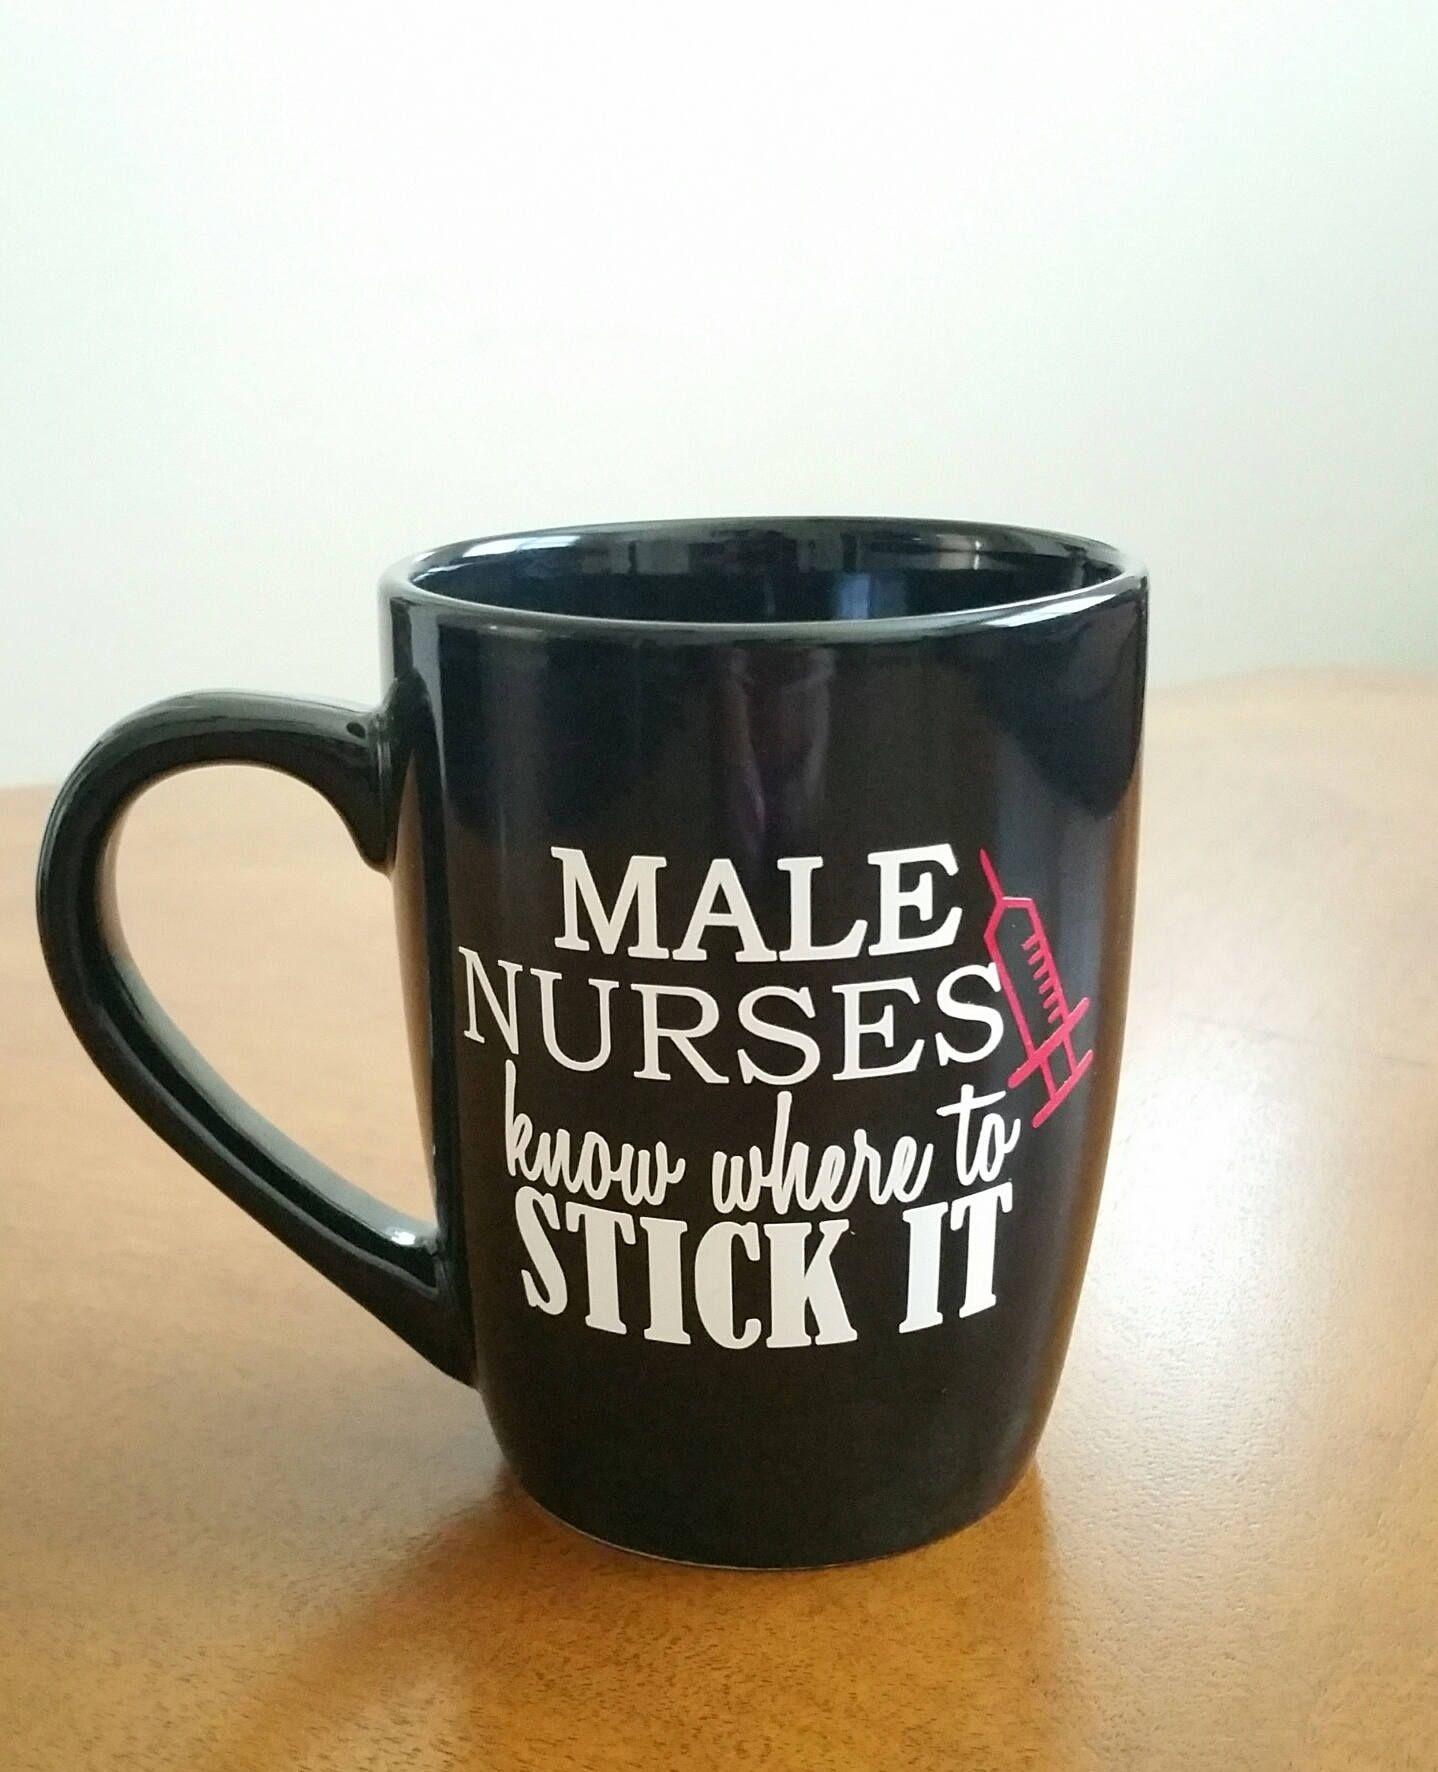 295f904ede0 Male Nurses Coffee Mug, Nurse, Male Nurse, Nursing Student, Nurse Gift,  Nurse Graduation Gift, Nurse Coffee Mug, RN Mug, Nurse Appreciation by ...